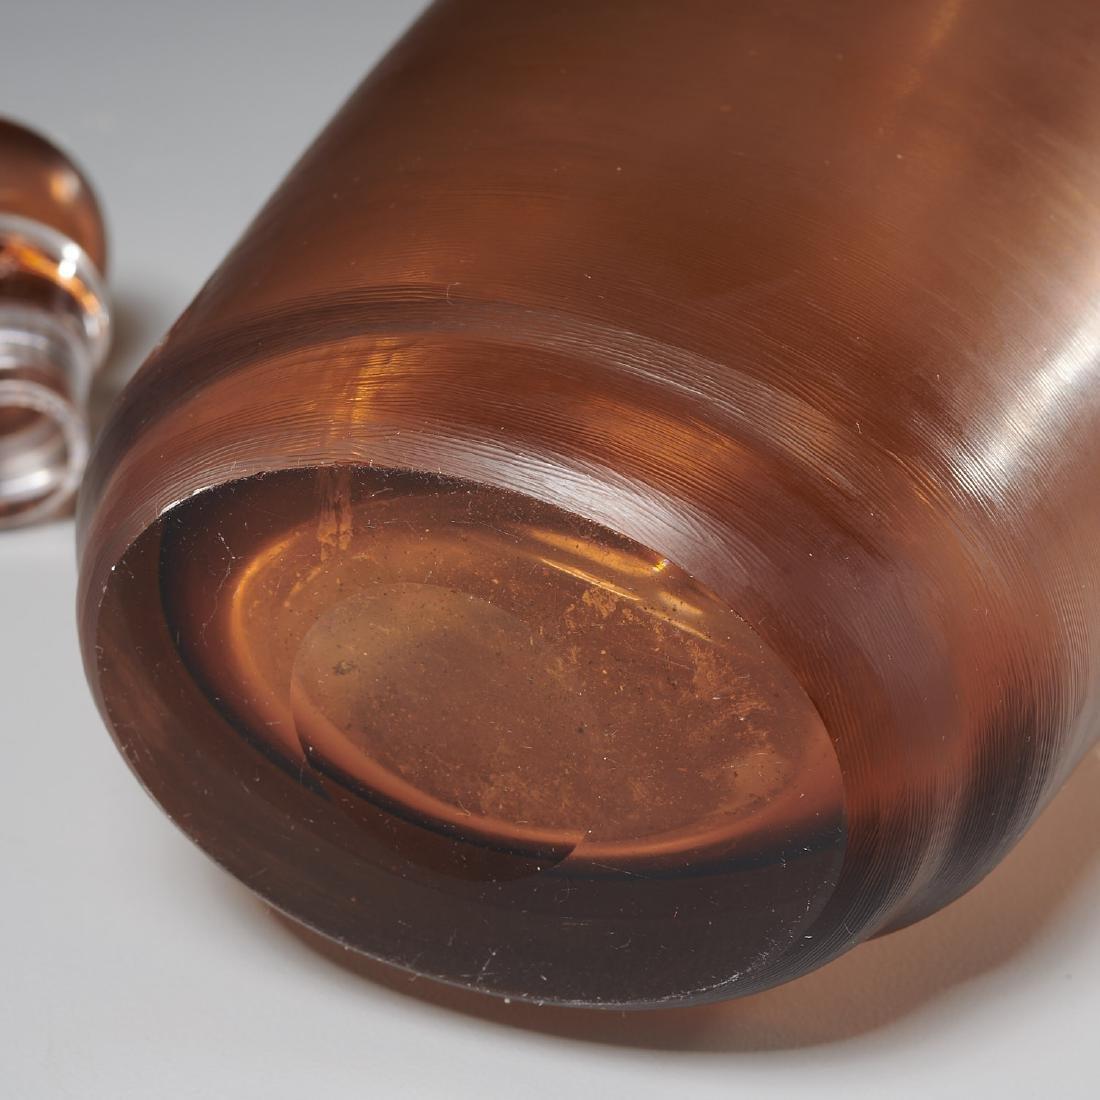 Paolo Venini inciso bottle and stopper - 5